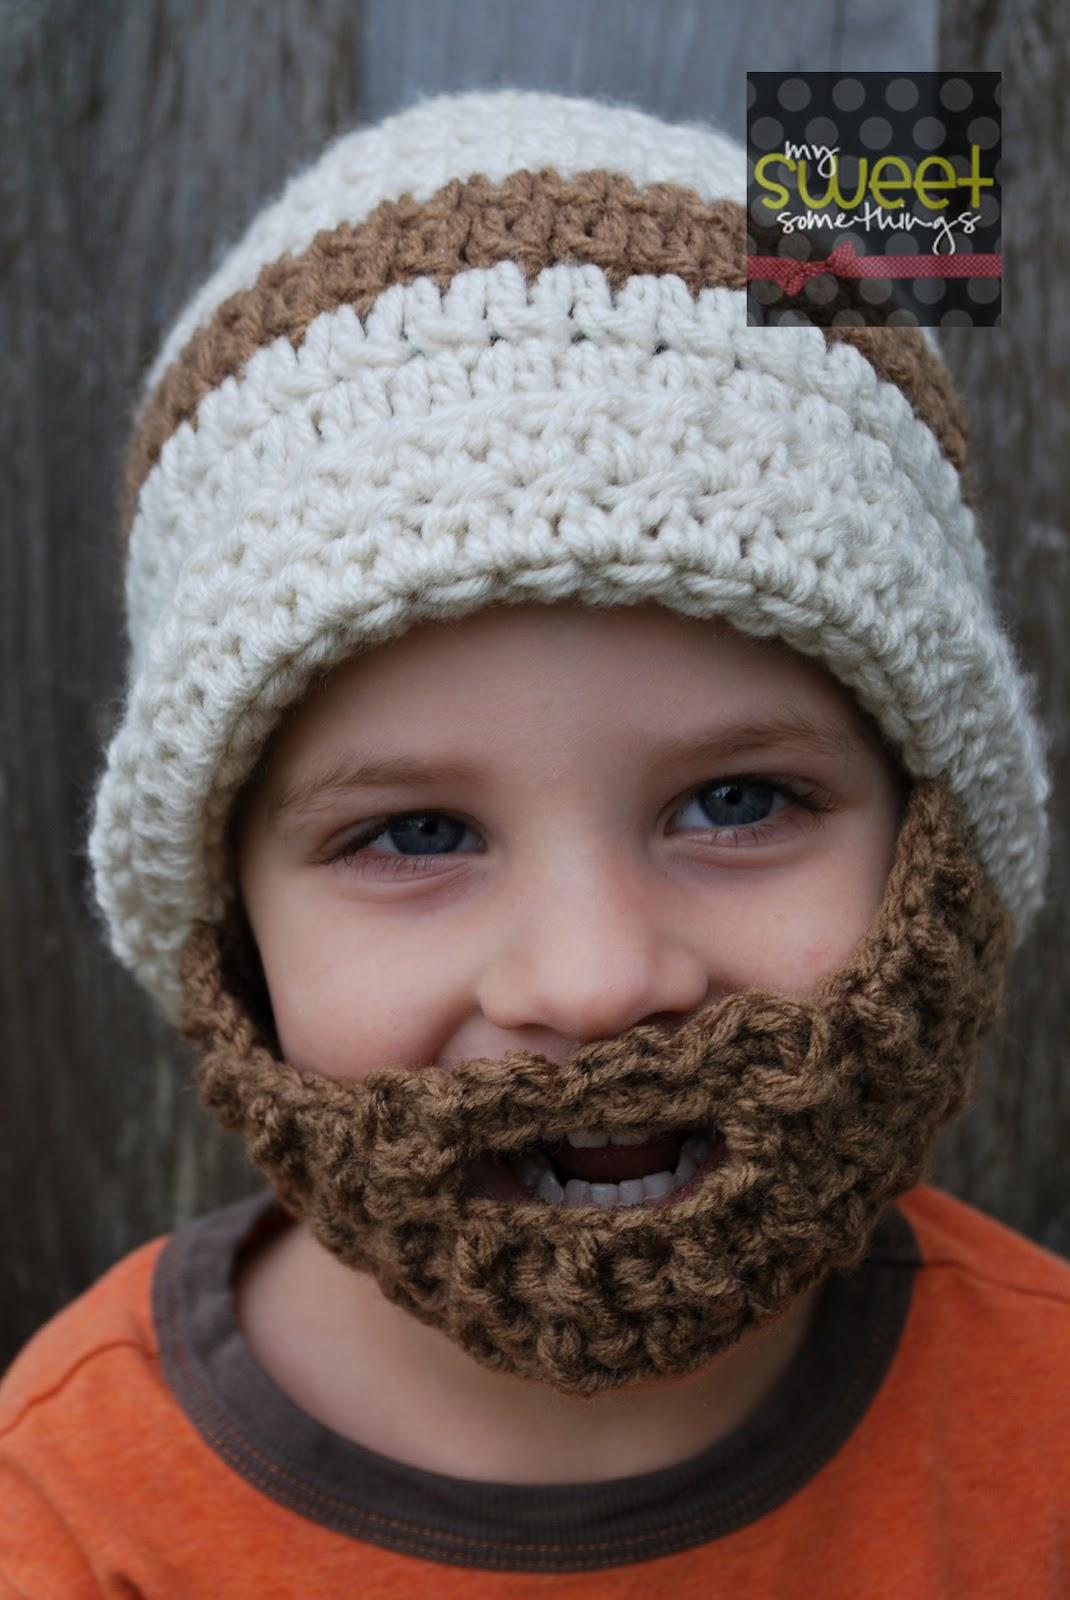 My Sweet Somethings Bearded Hat For Kids